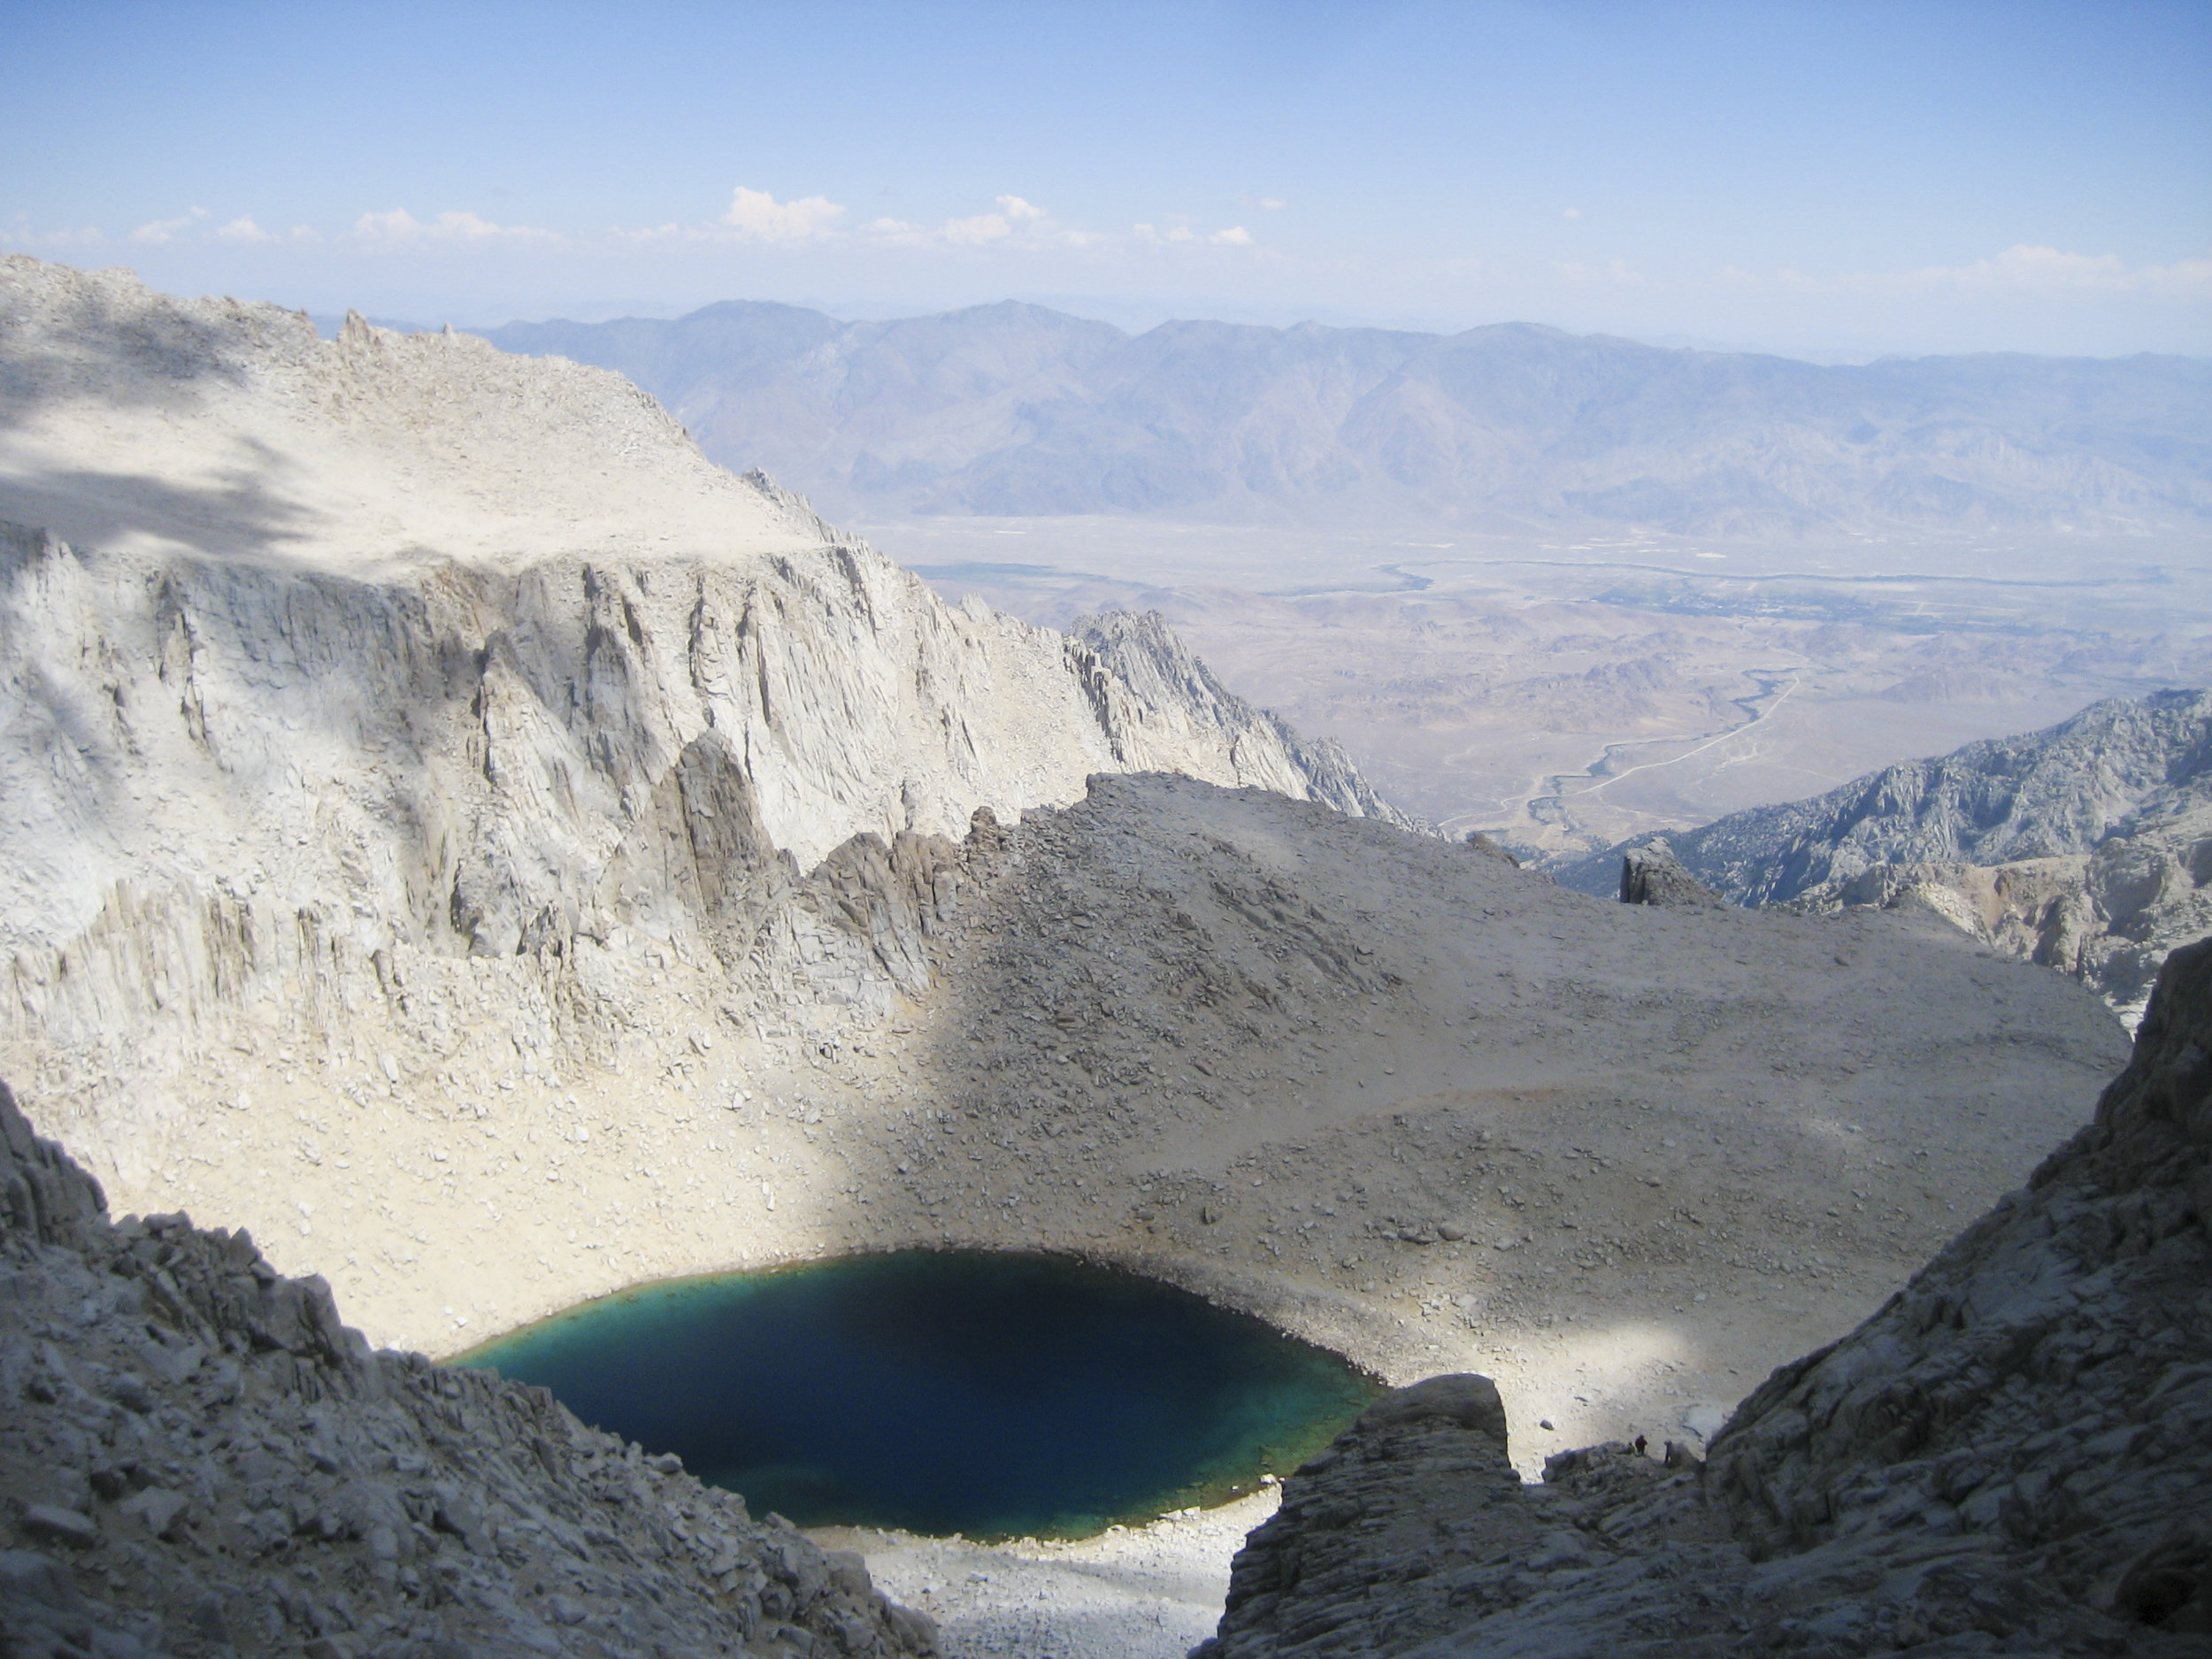 chrissihernandez-california-mount-whitney-hike (9)copy.jpg